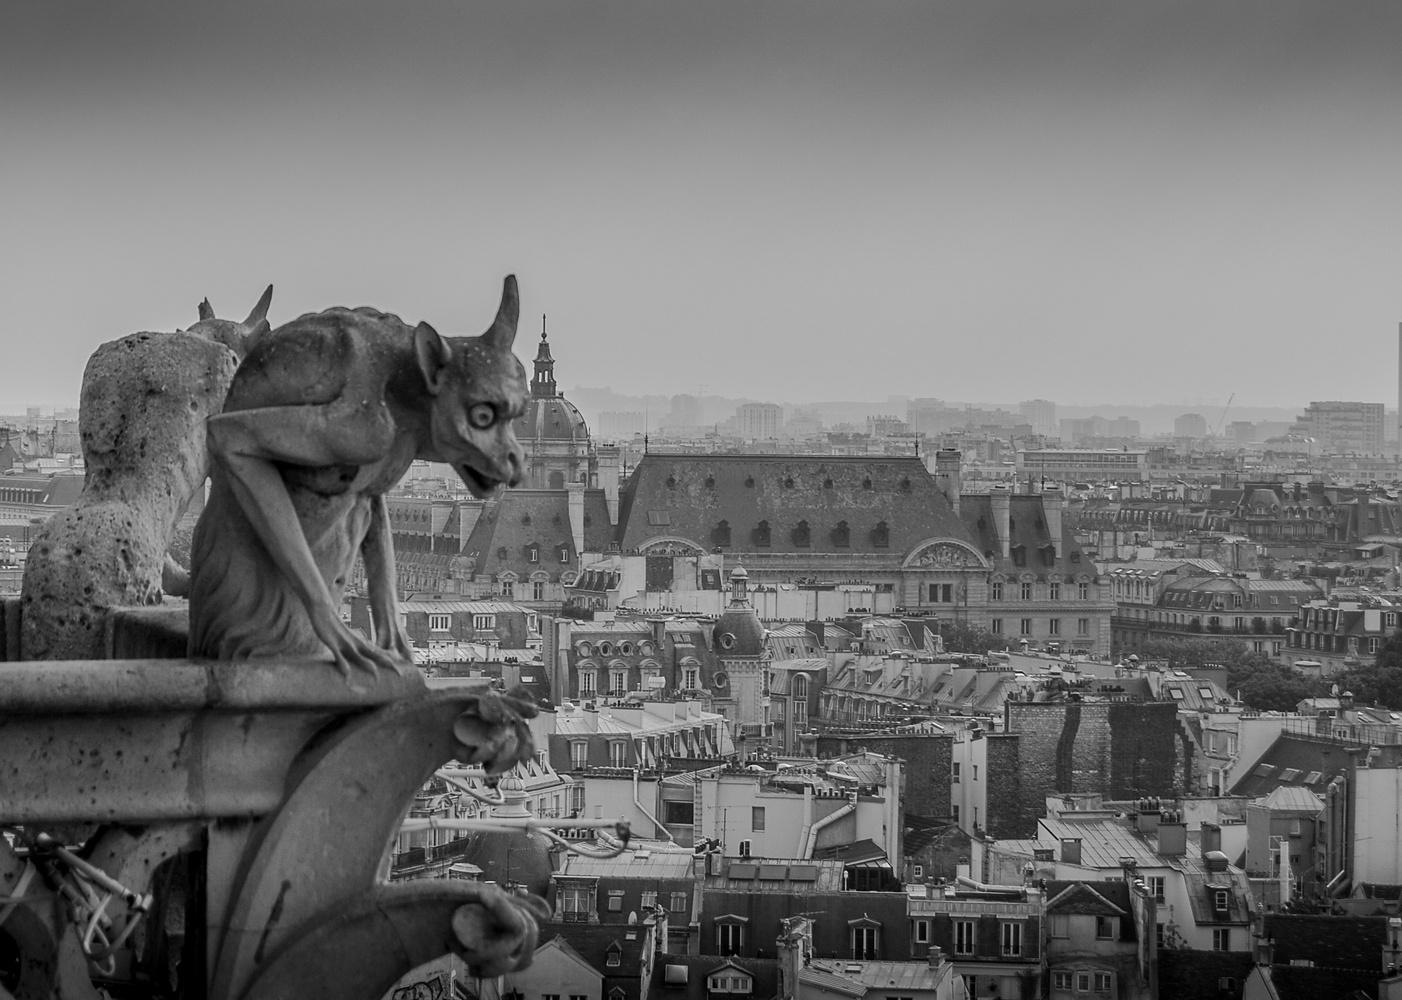 Paris City scene by John Nicholson